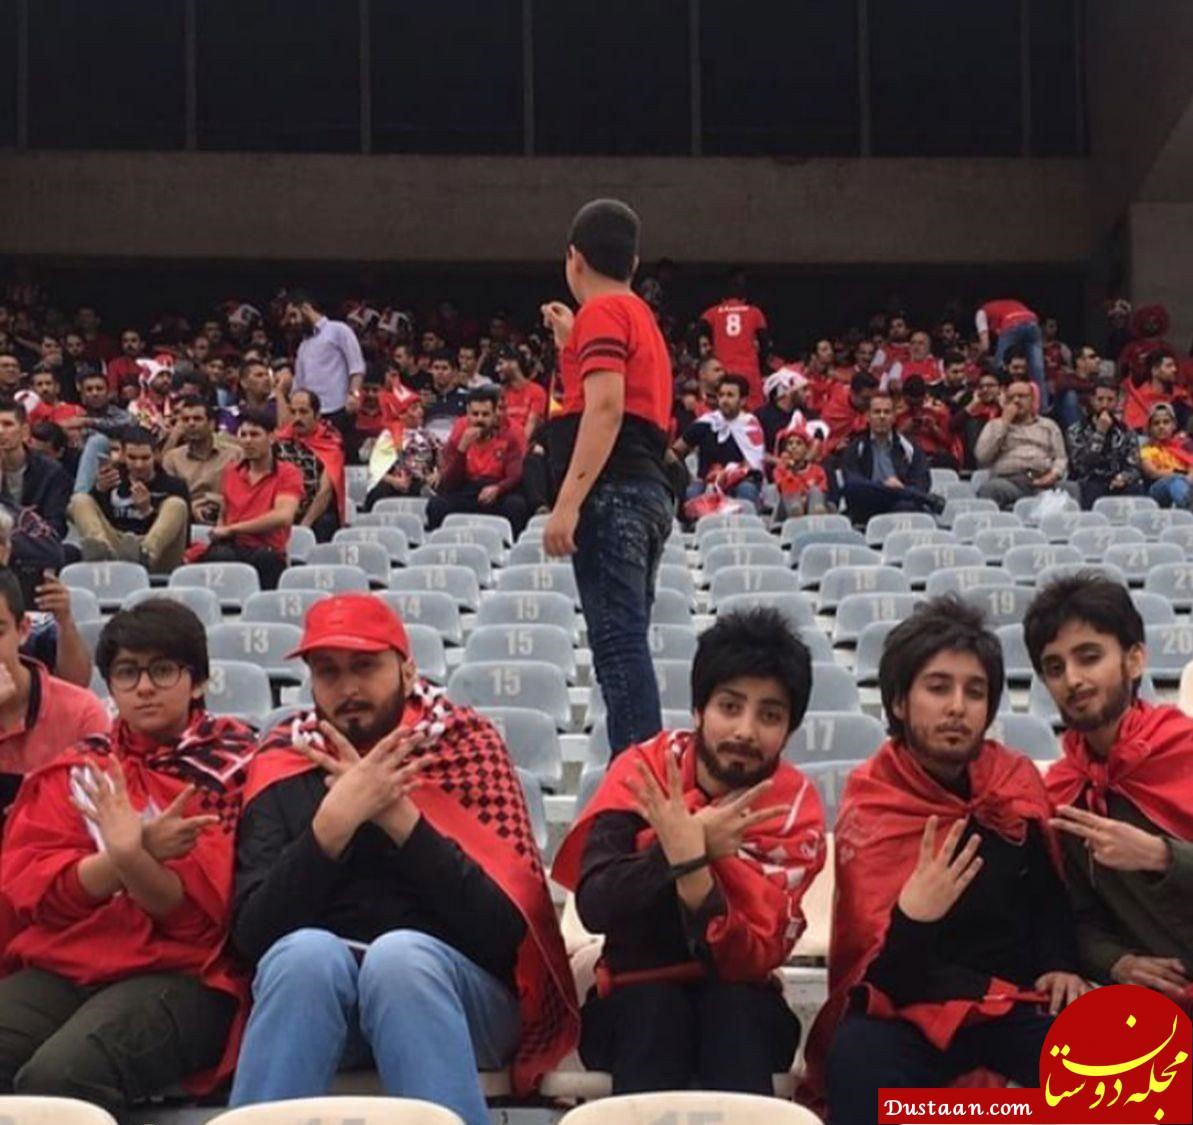 www.dustaan.com ۵ دختری که برای دیدن بازی پرسپولیس به ورزشگاه آزادی رفتند! +عکس